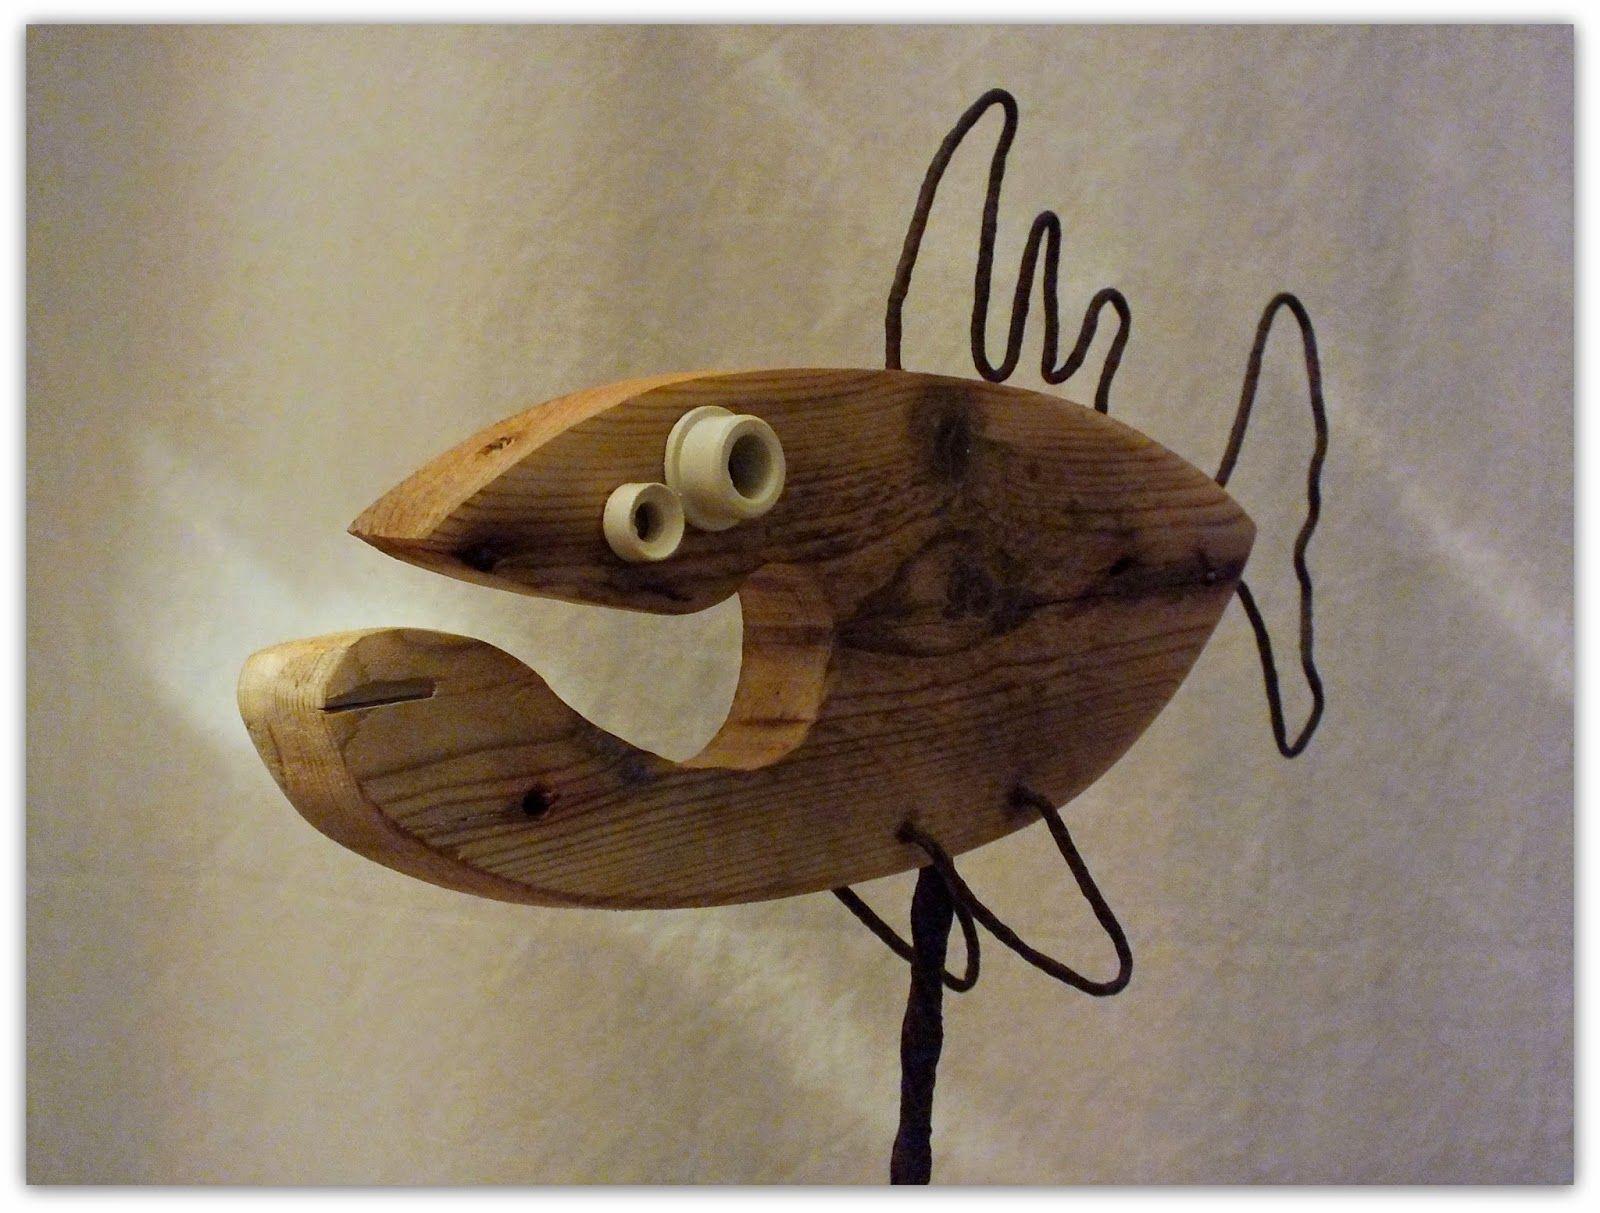 o fishl driftwood funny fish poisson en bois flotté legni di